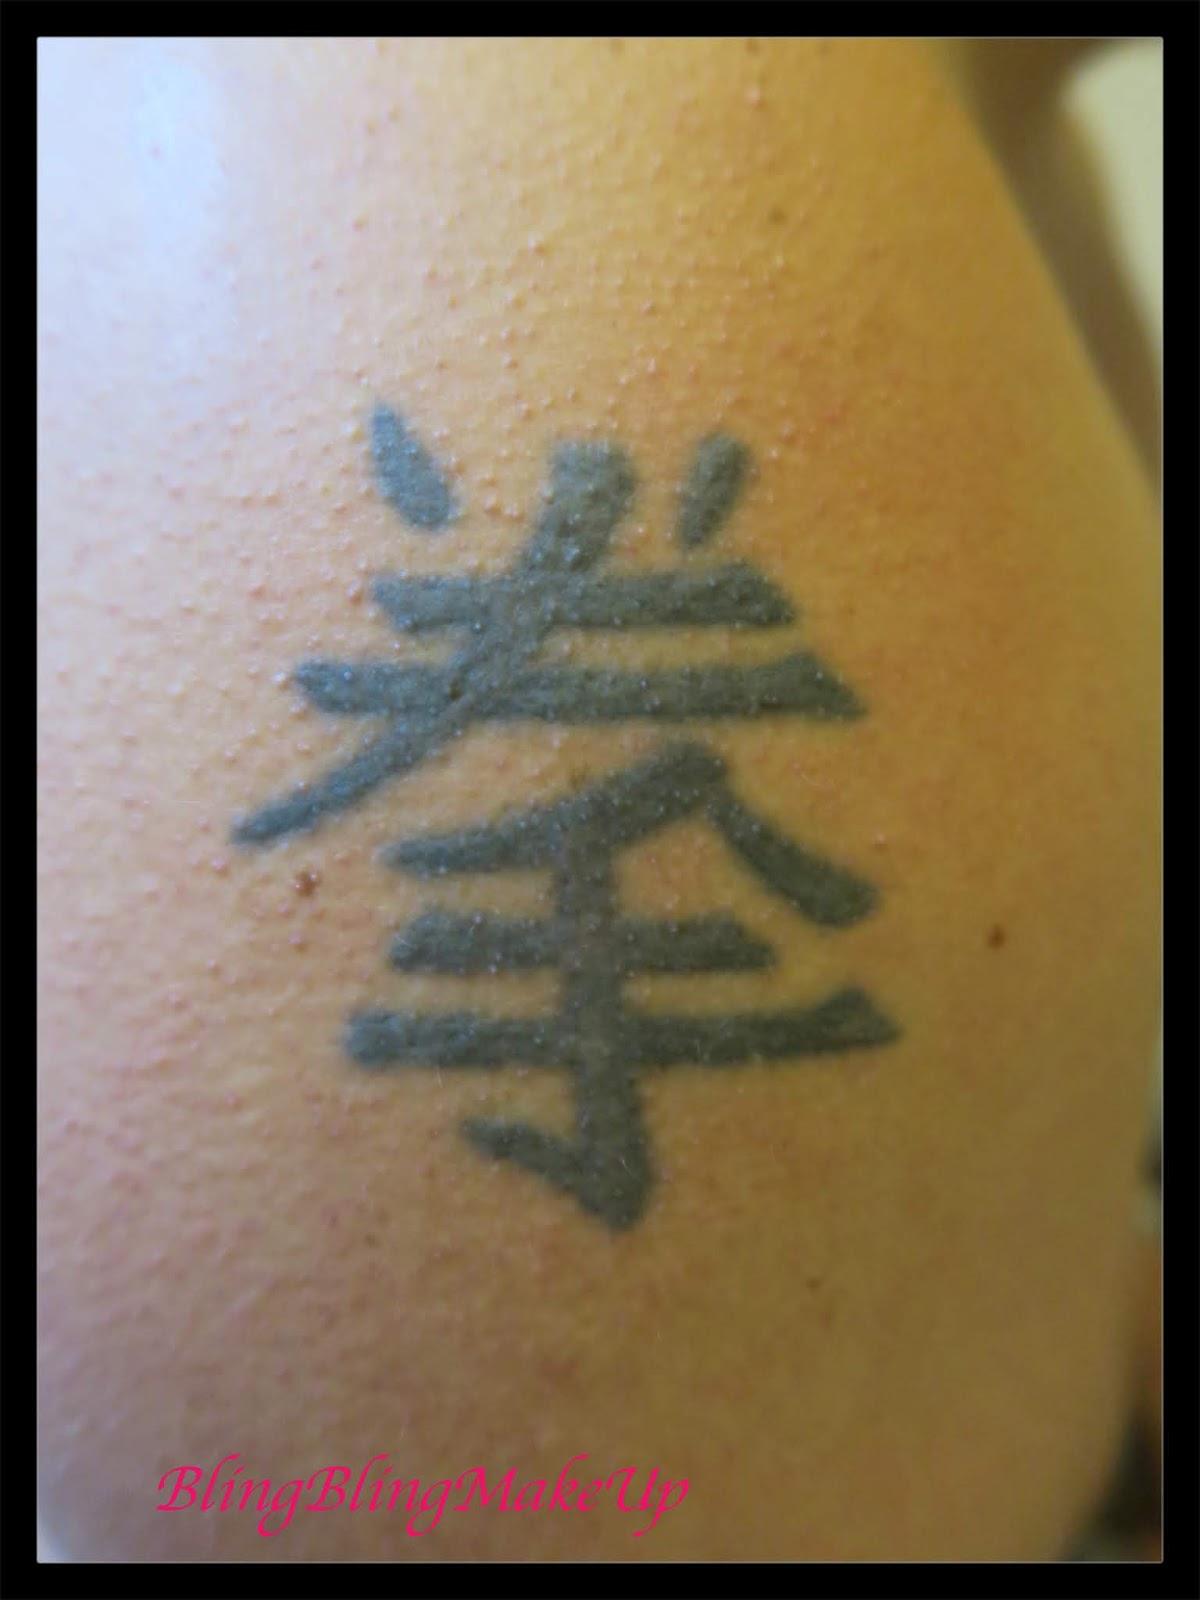 Bling Bling Makeup Usuwanie Tatuaży Ii